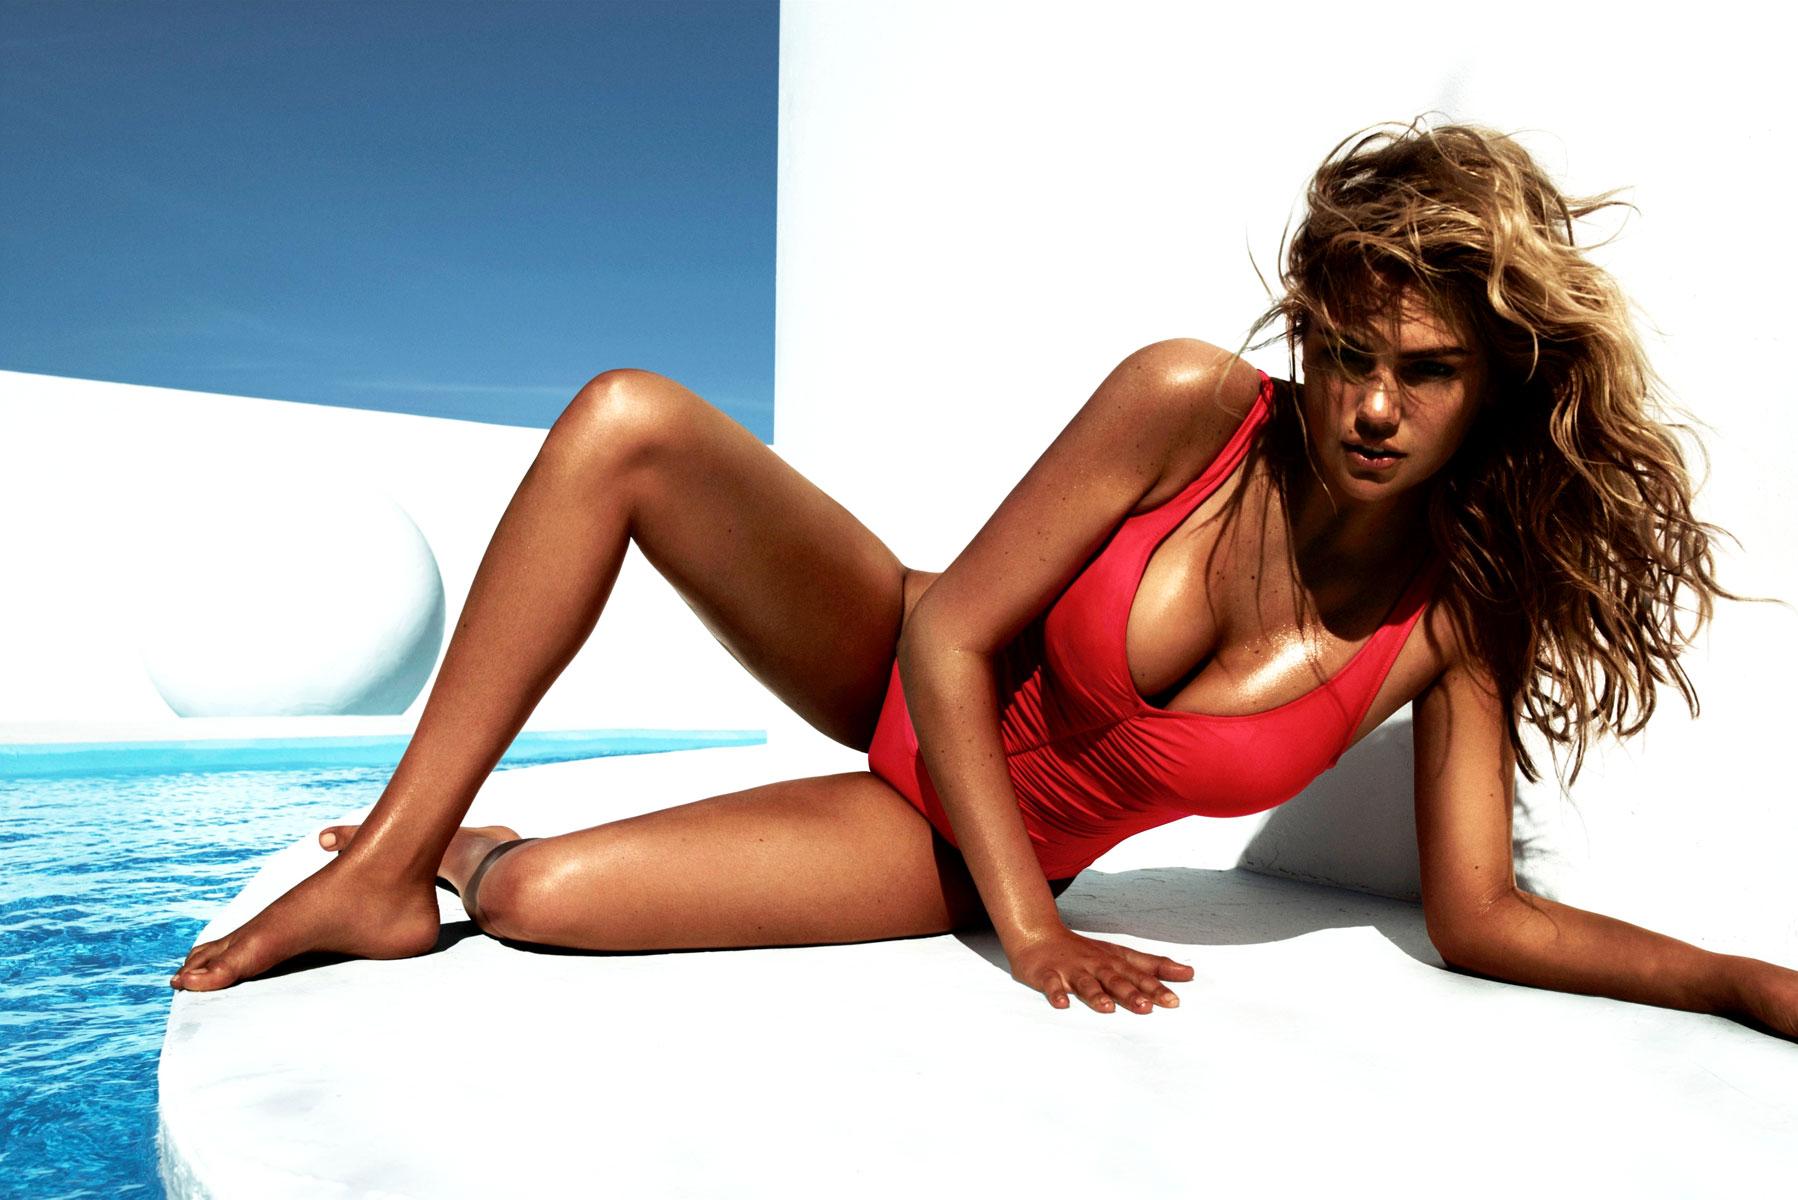 Kate upton in swimsuits at miguel reveriego photoshoot hawtcelebs kate upton altavistaventures Choice Image